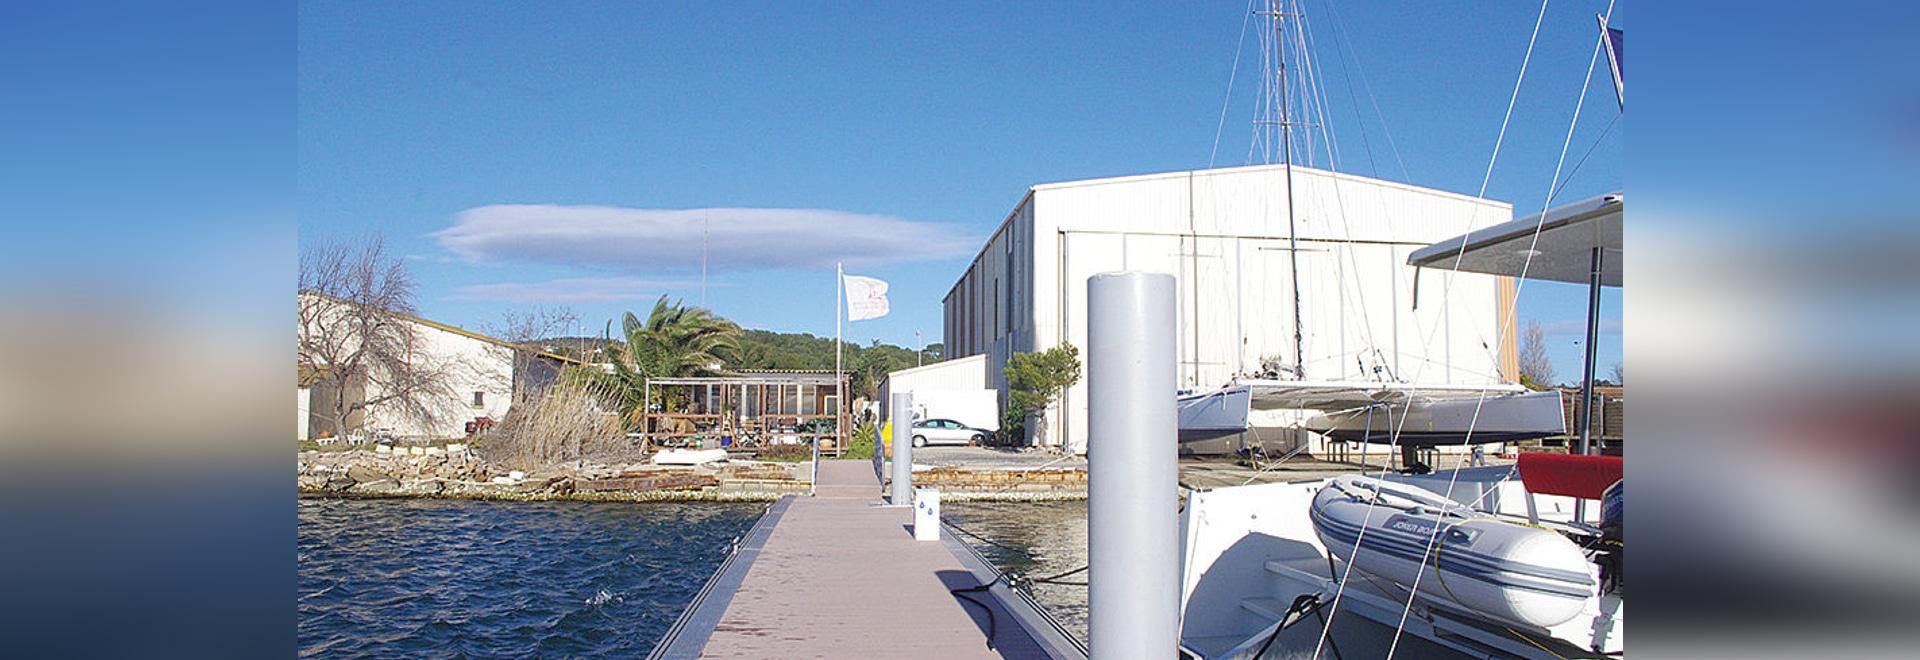 En visite au chantier Swiss Catamaran